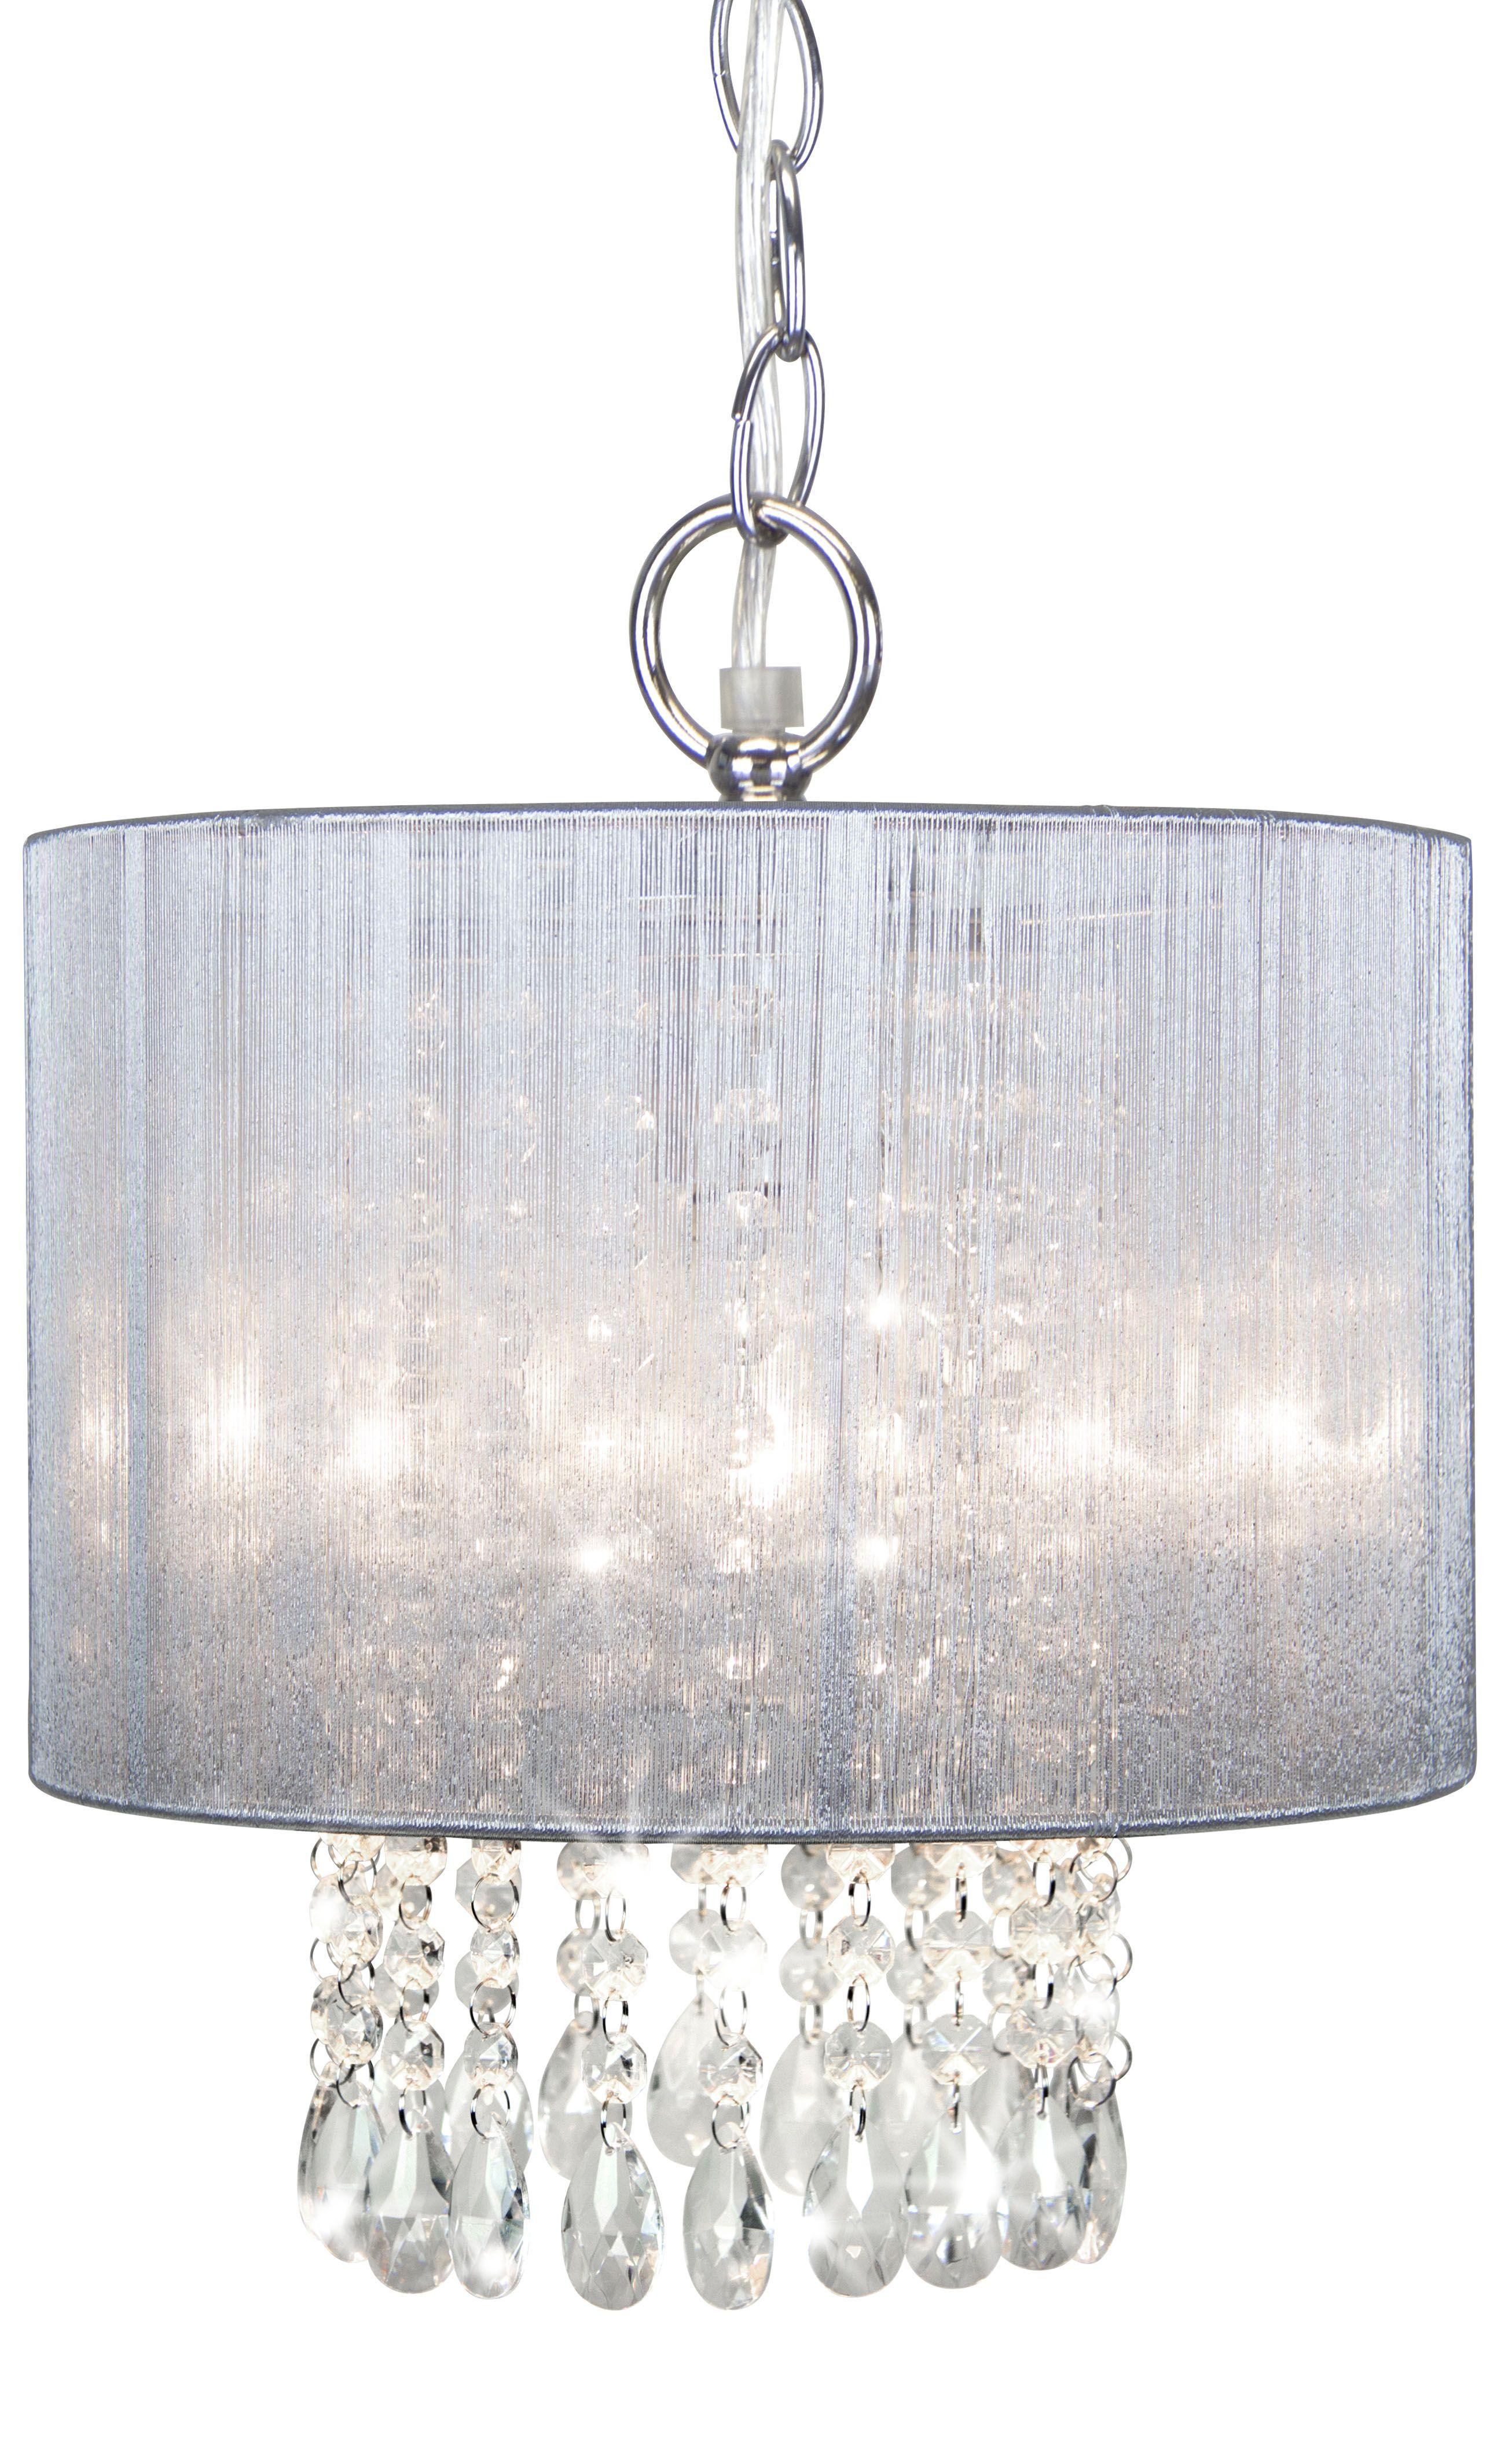 Light 240v Pendant Cafe Sil Shd Glass Bd Cassy Bun016